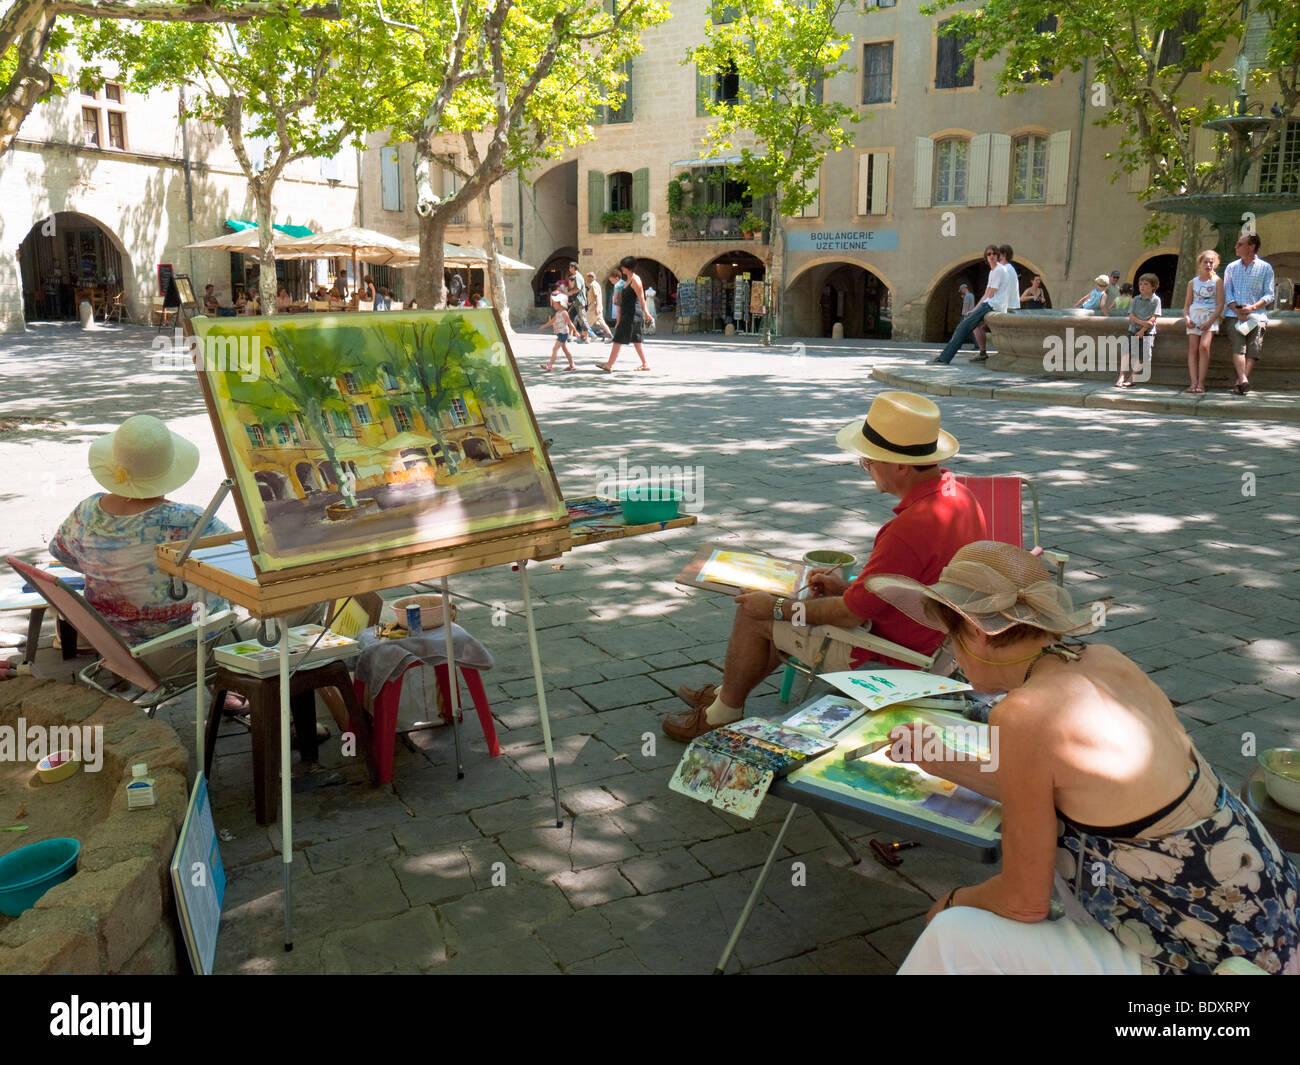 Hobby pittori lavorare sulla centrale piazza Place aux Herbes a Uzès, Francia meridionale. Immagini Stock